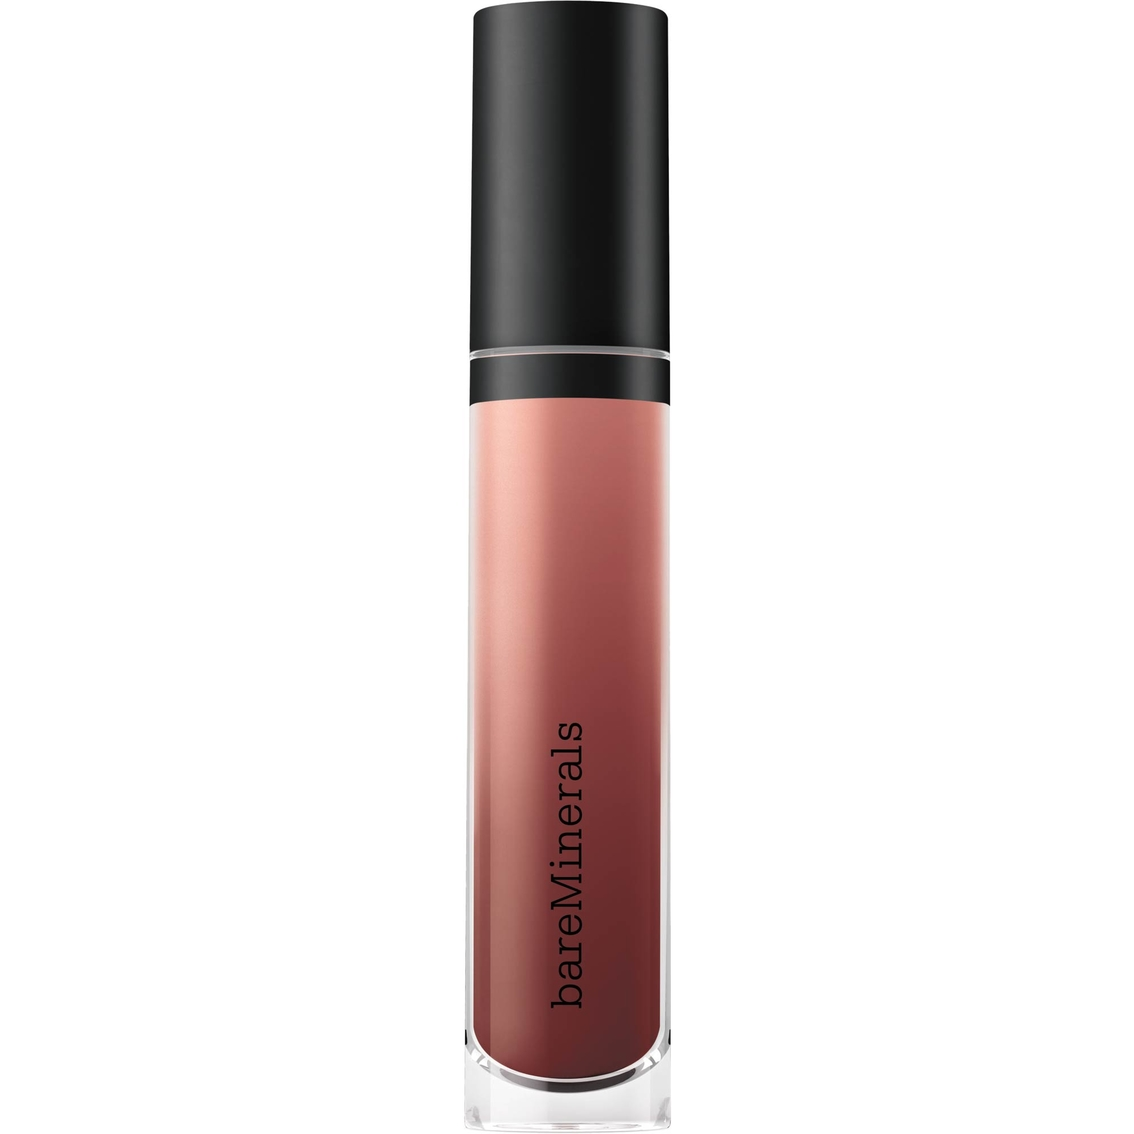 Buy bareMinerals - Gen Nude Matte Liquid Lipcolour - Bo$$